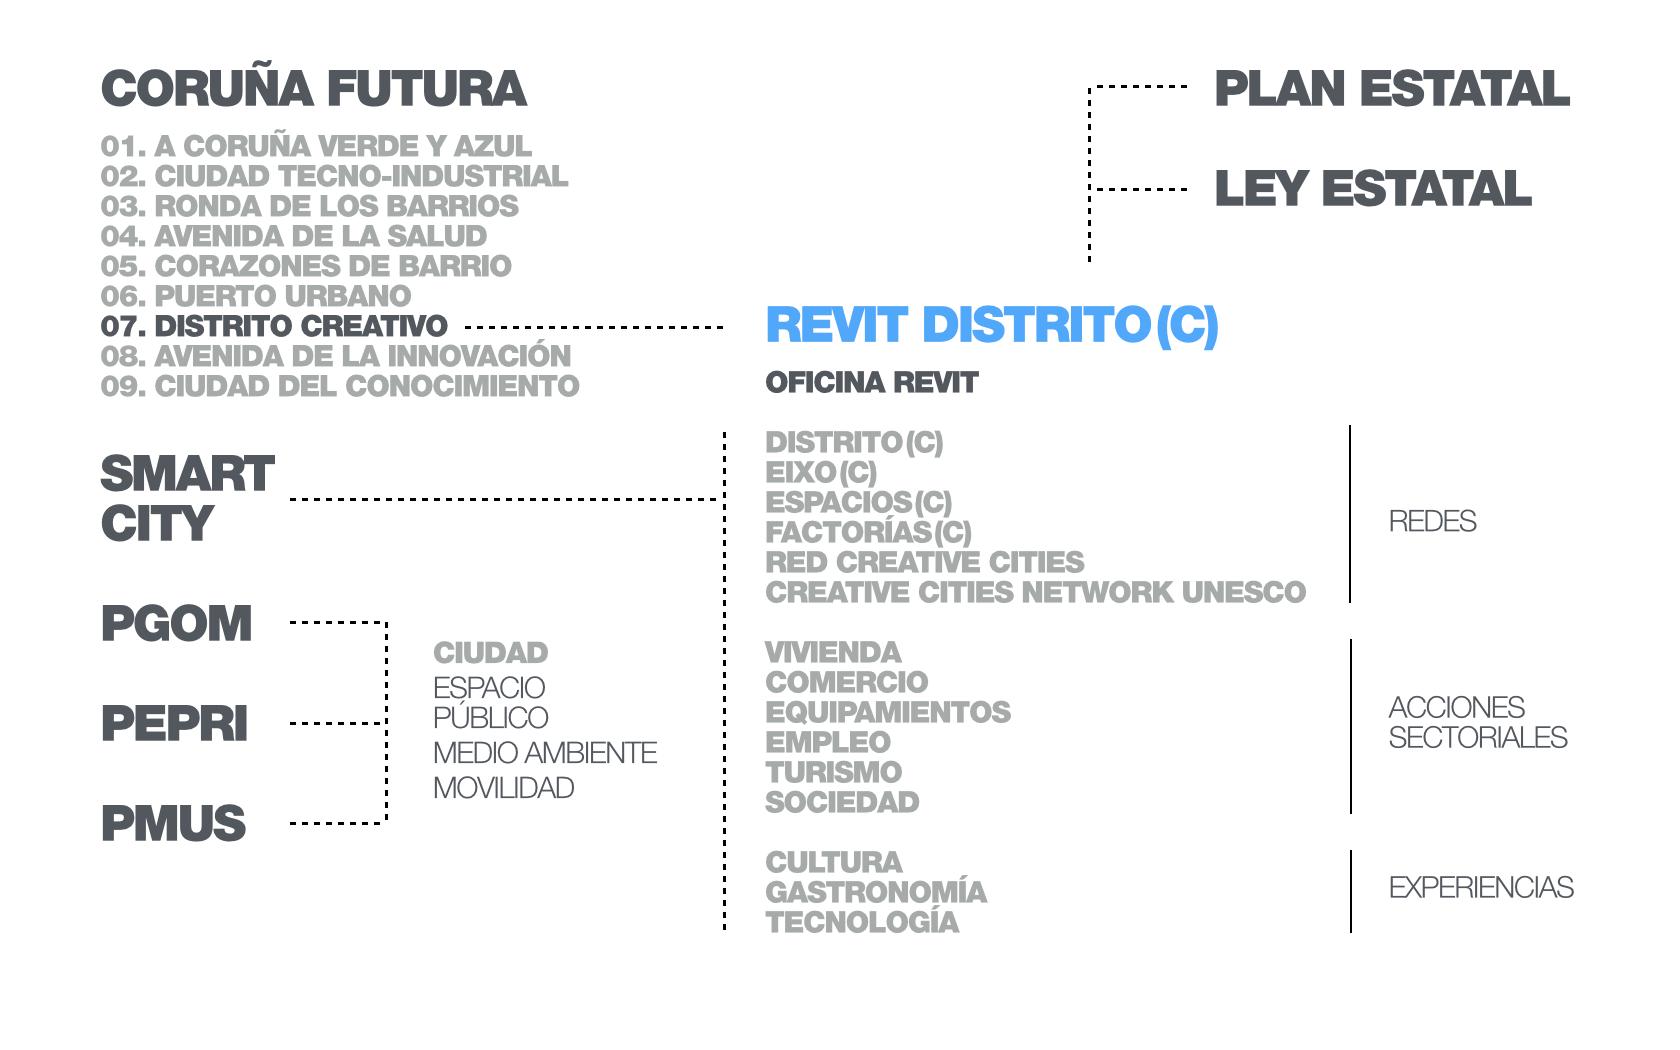 REVIT DISTRITO(C) 09.jpg